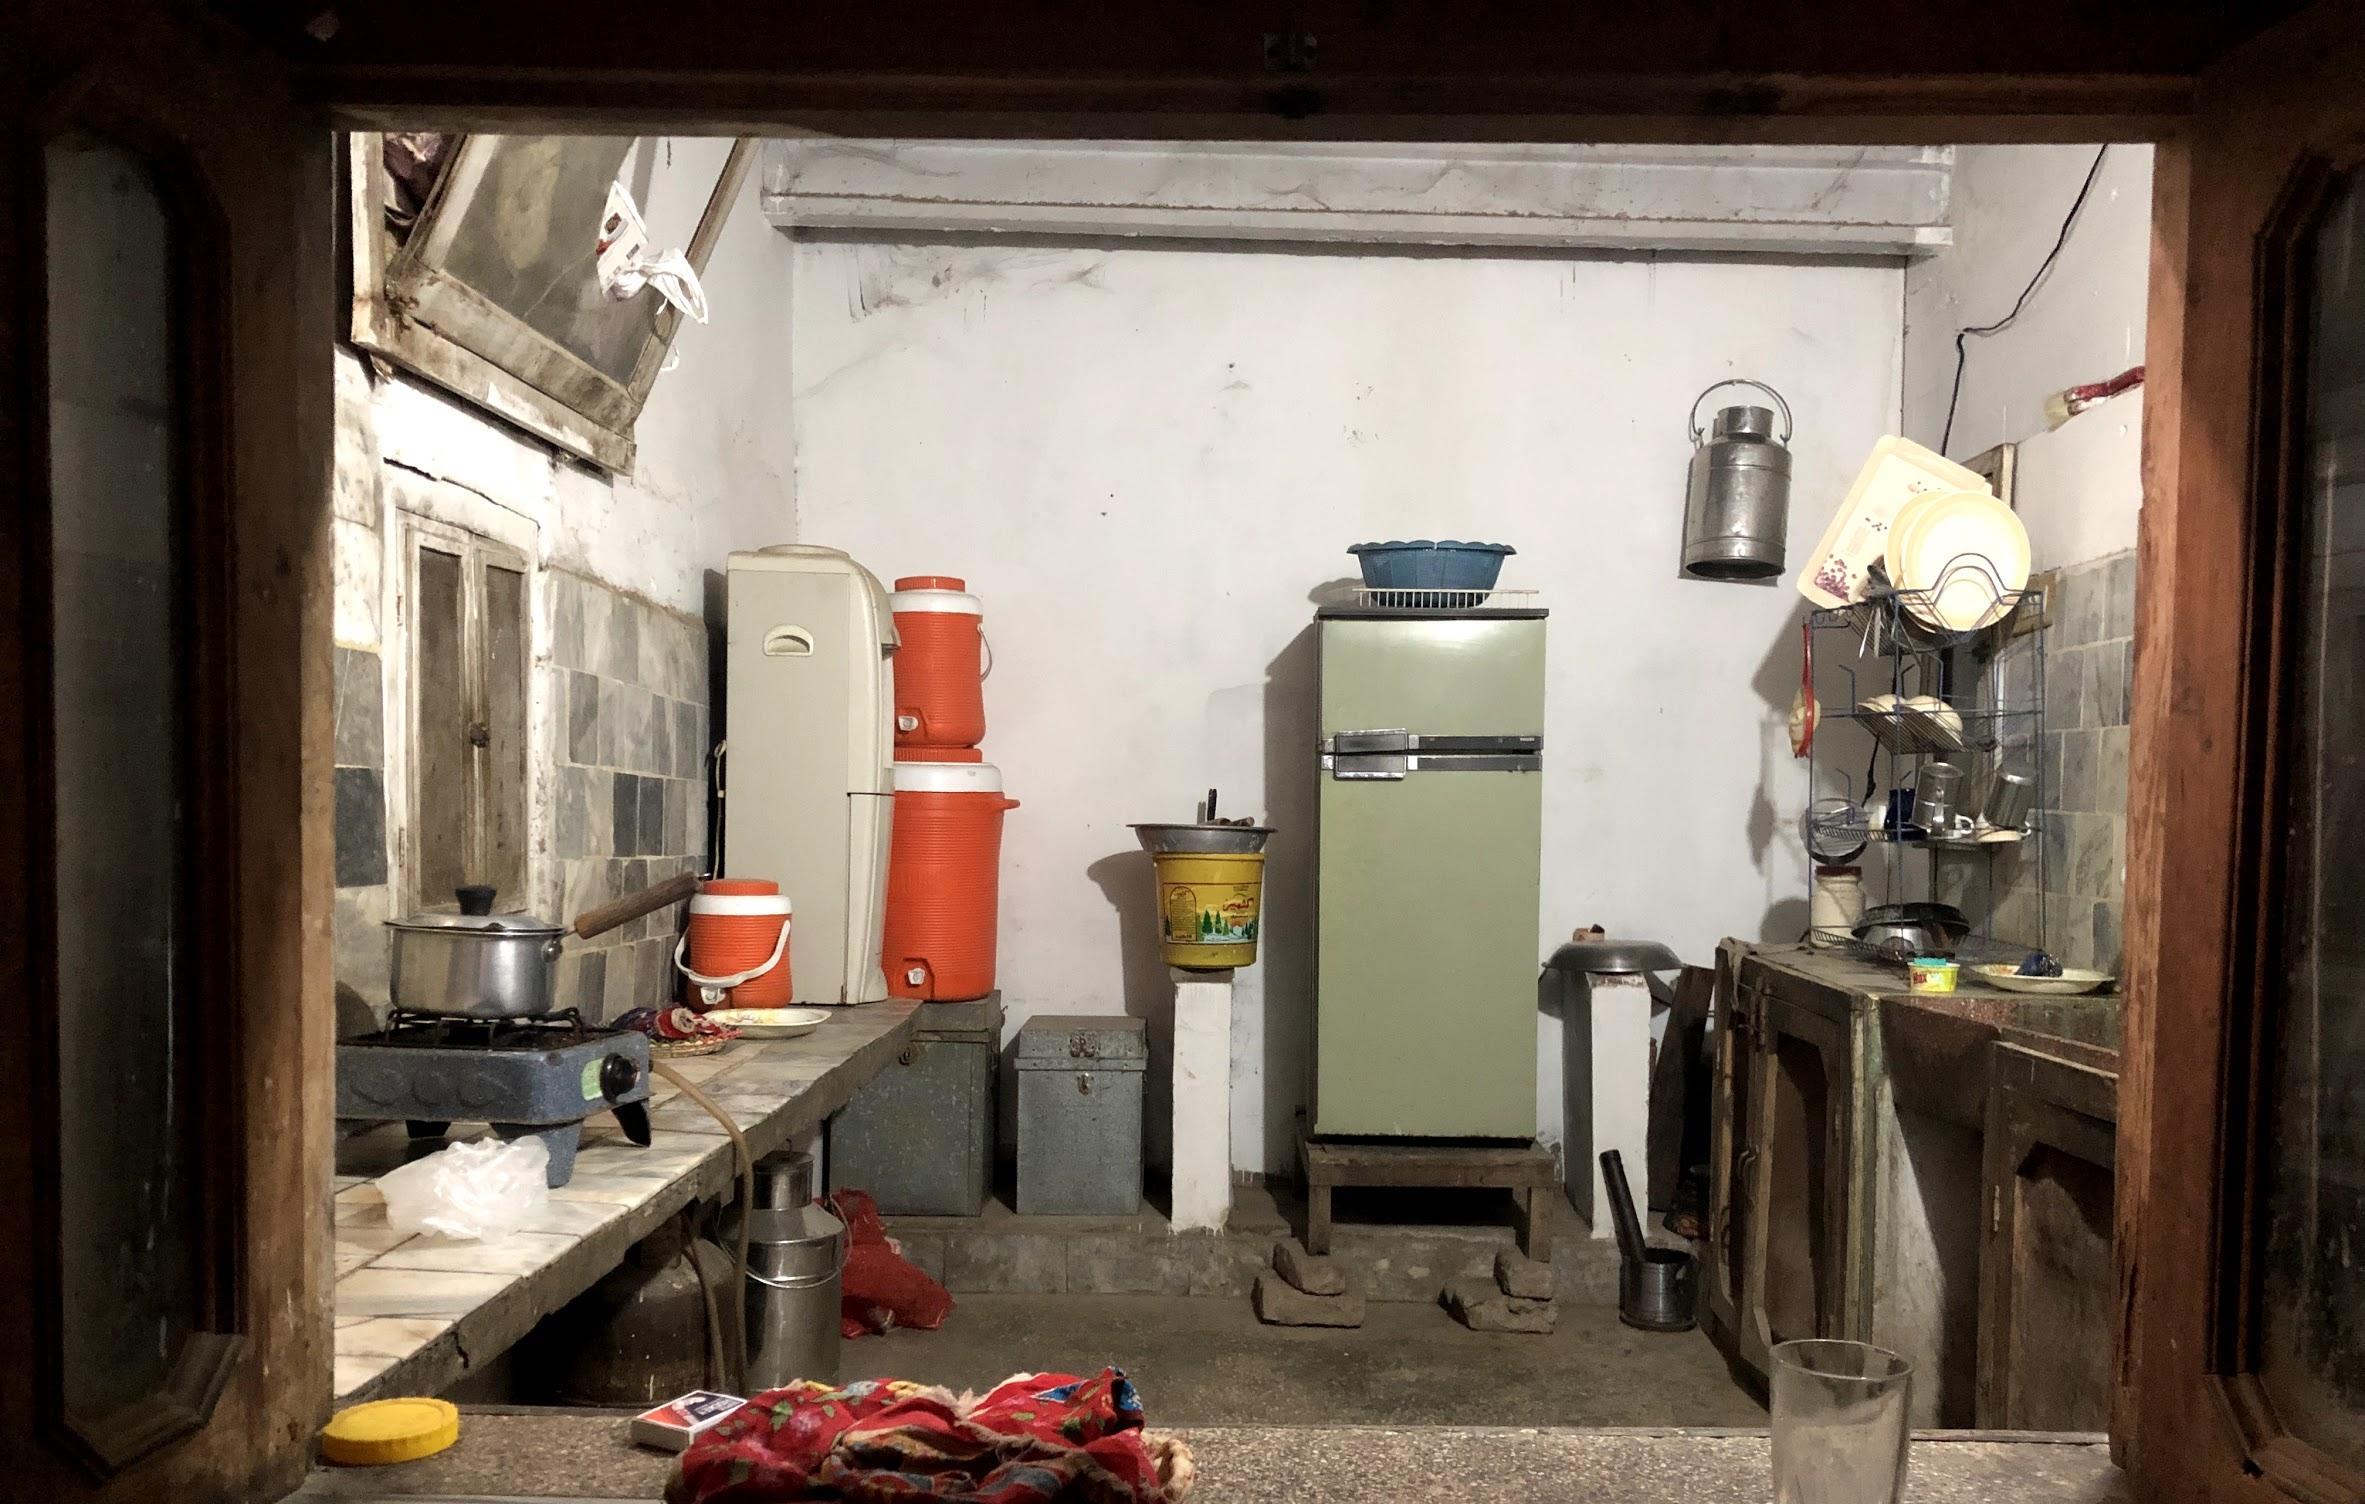 A village landlord's home kitchen in Khudian Khas (Pakistan)